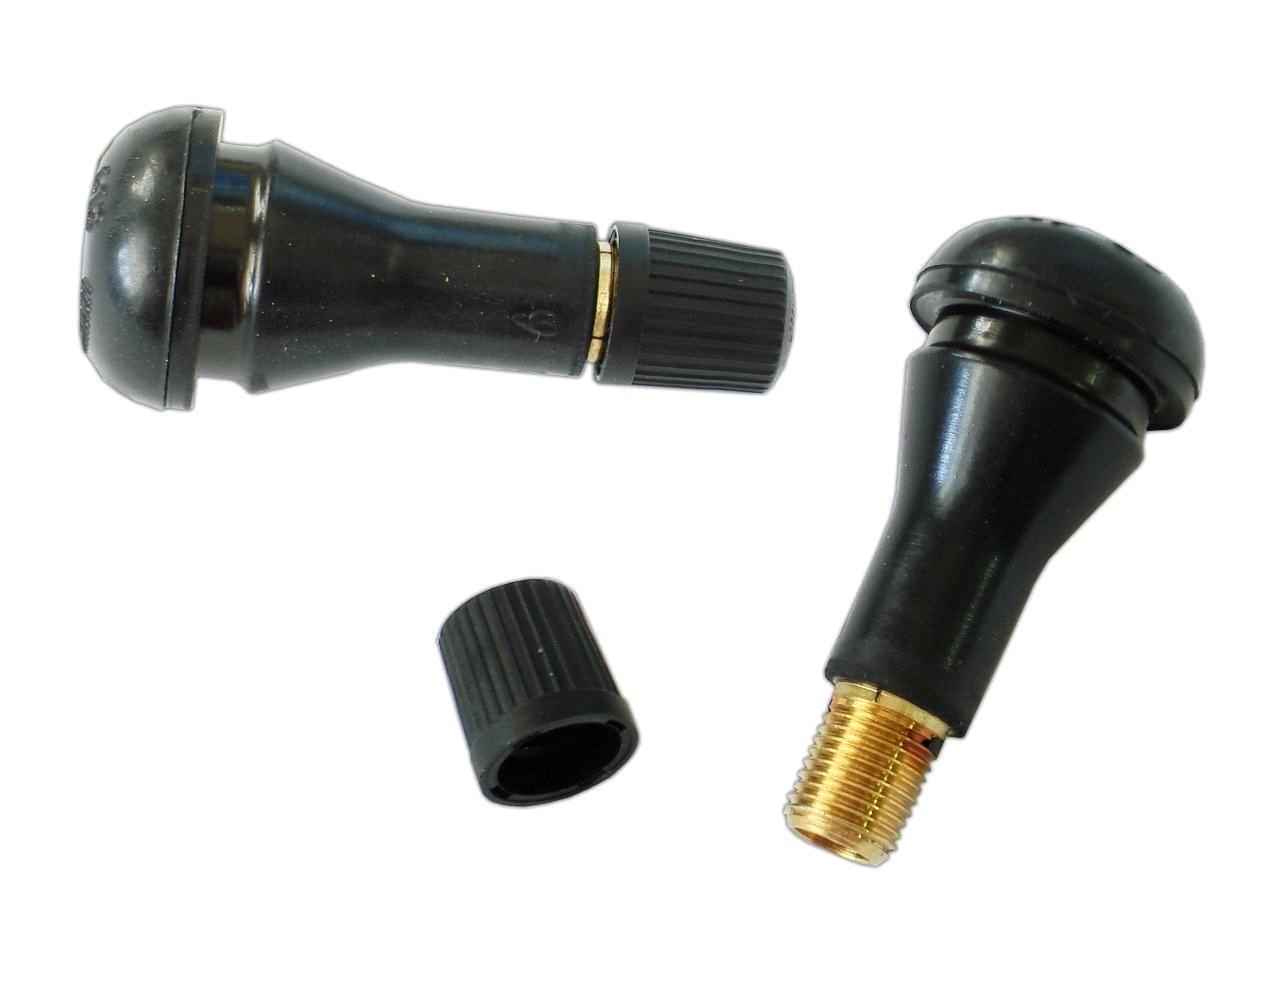 valves pneus valve pneu sur enperdresonlapin. Black Bedroom Furniture Sets. Home Design Ideas